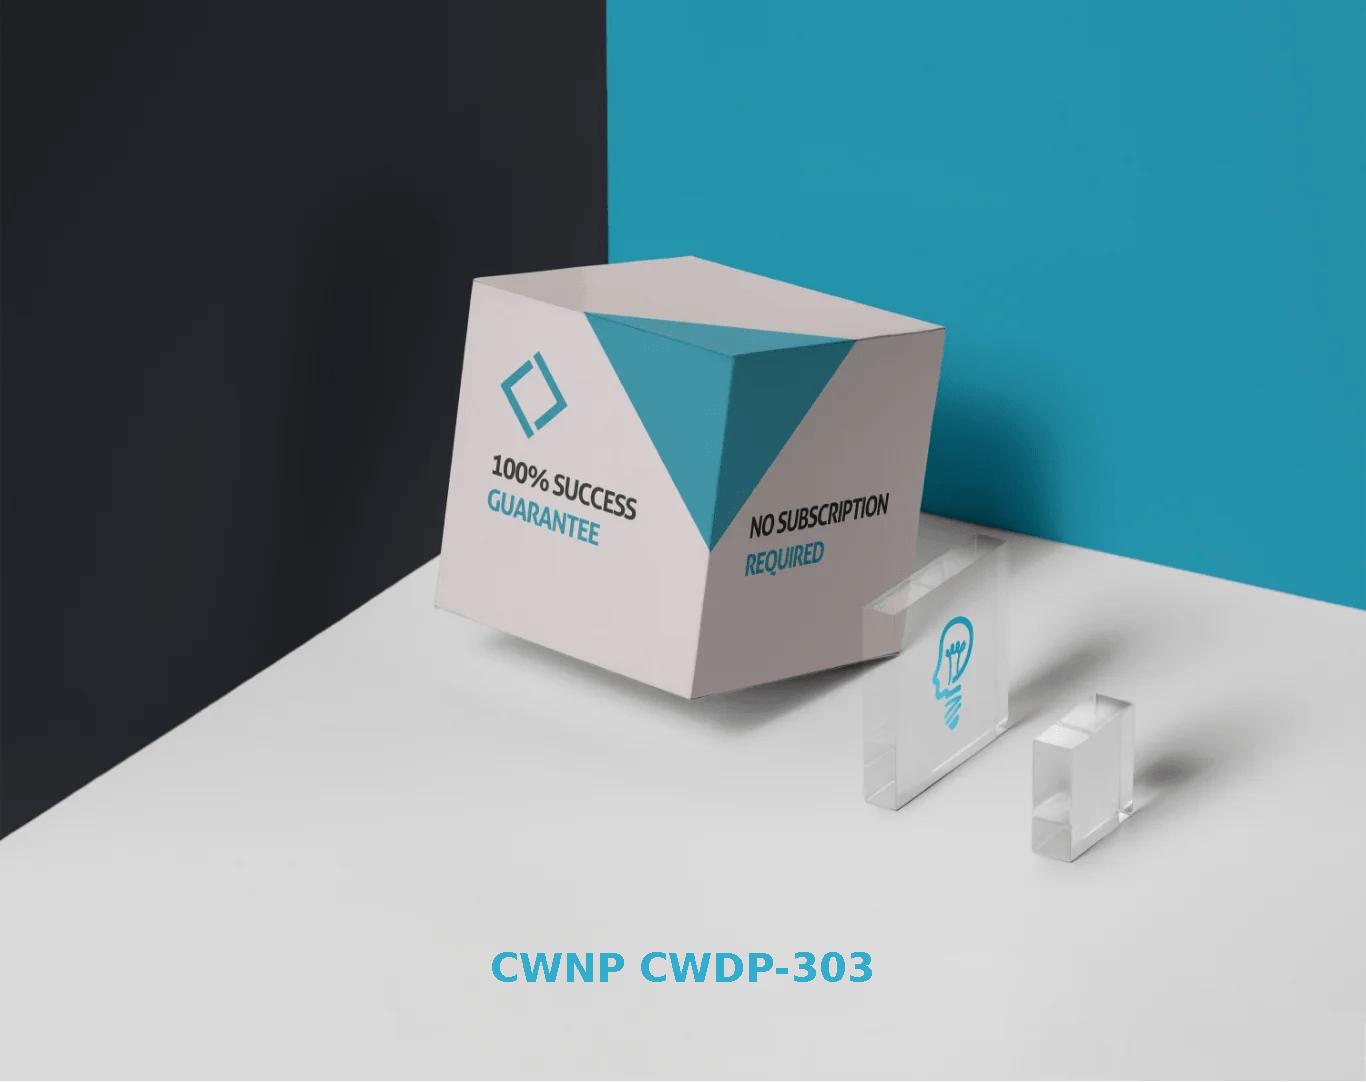 CWDP-303 Dumps